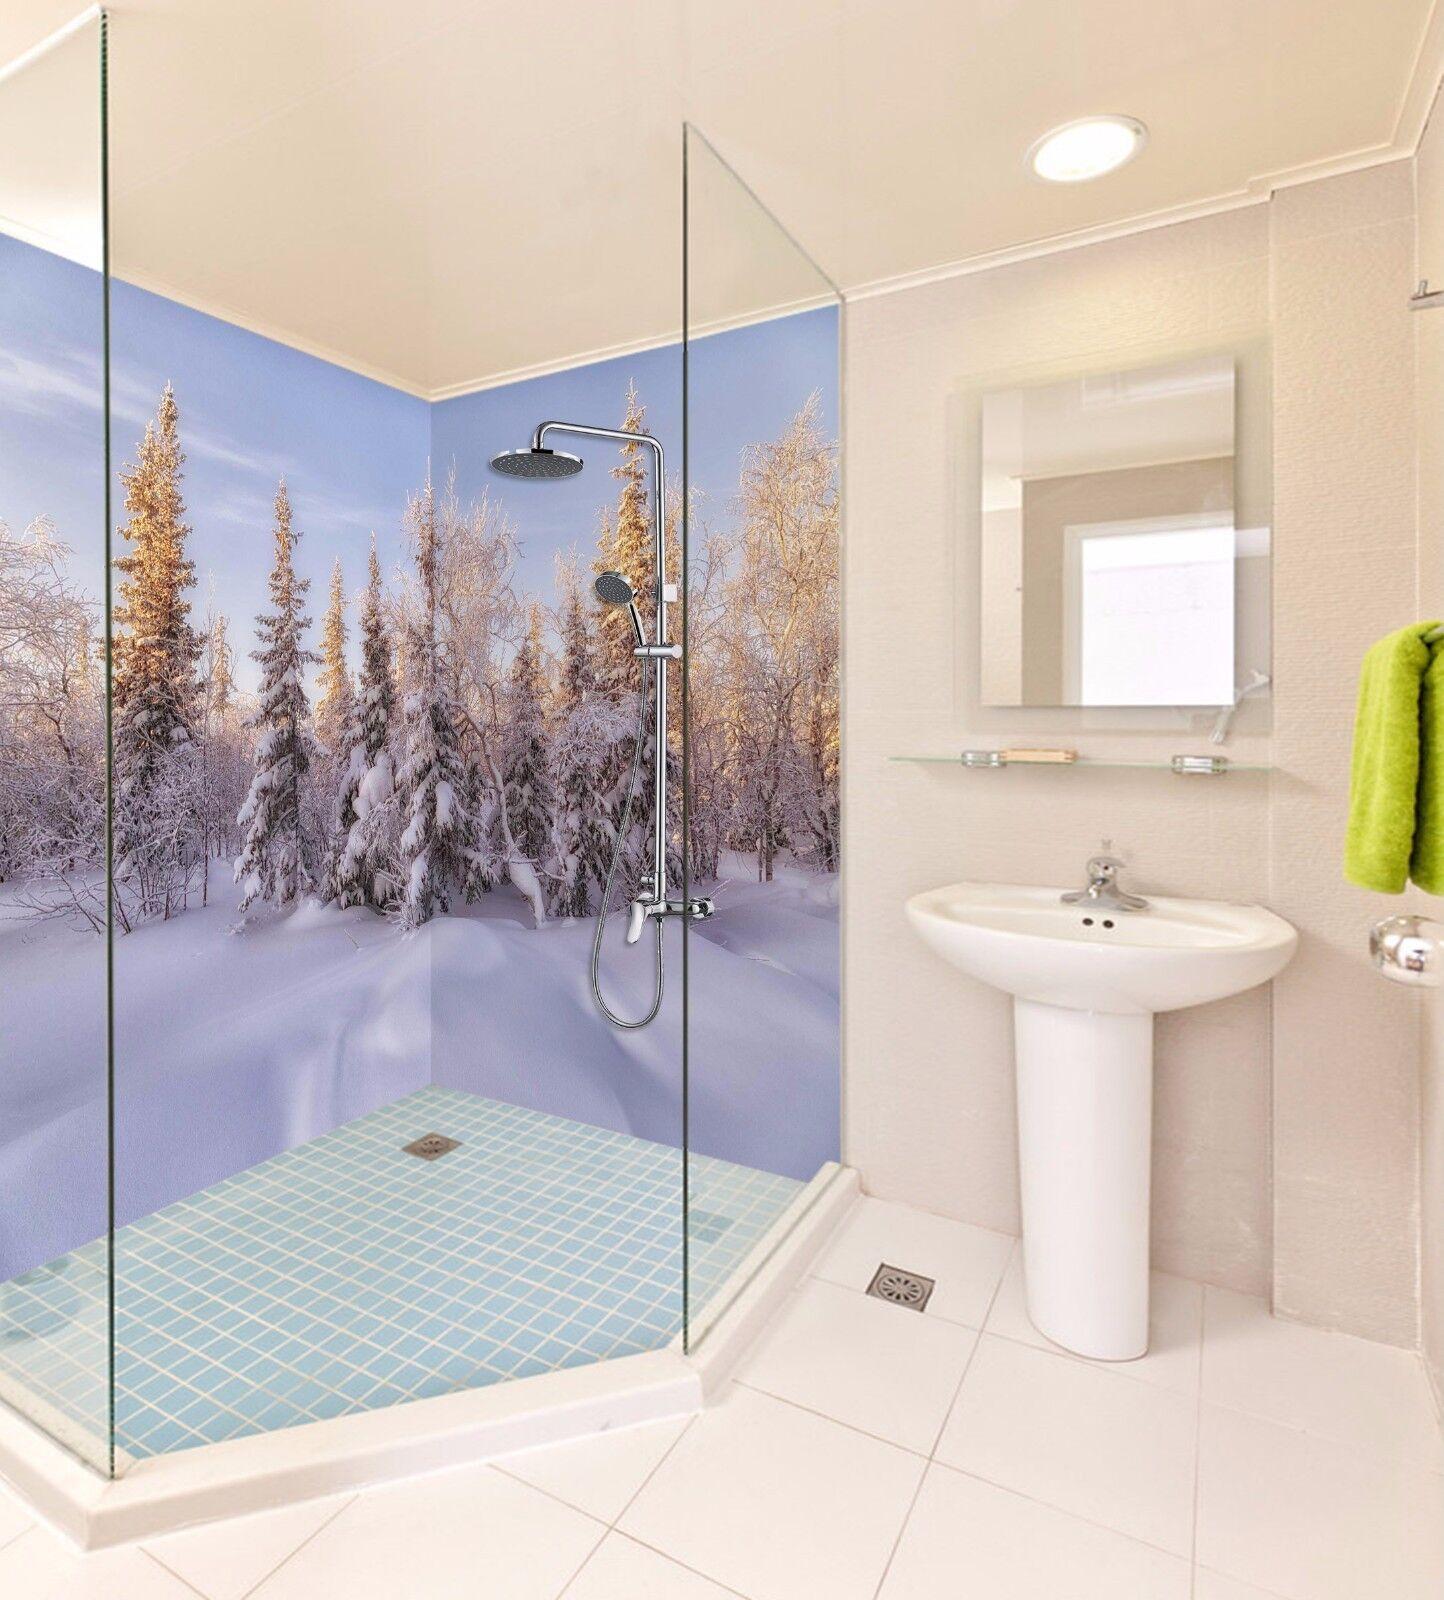 3D Snowy Nature 463 WallPaper Bathroom Print Decal Wall Deco AJ WALLPAPER AU